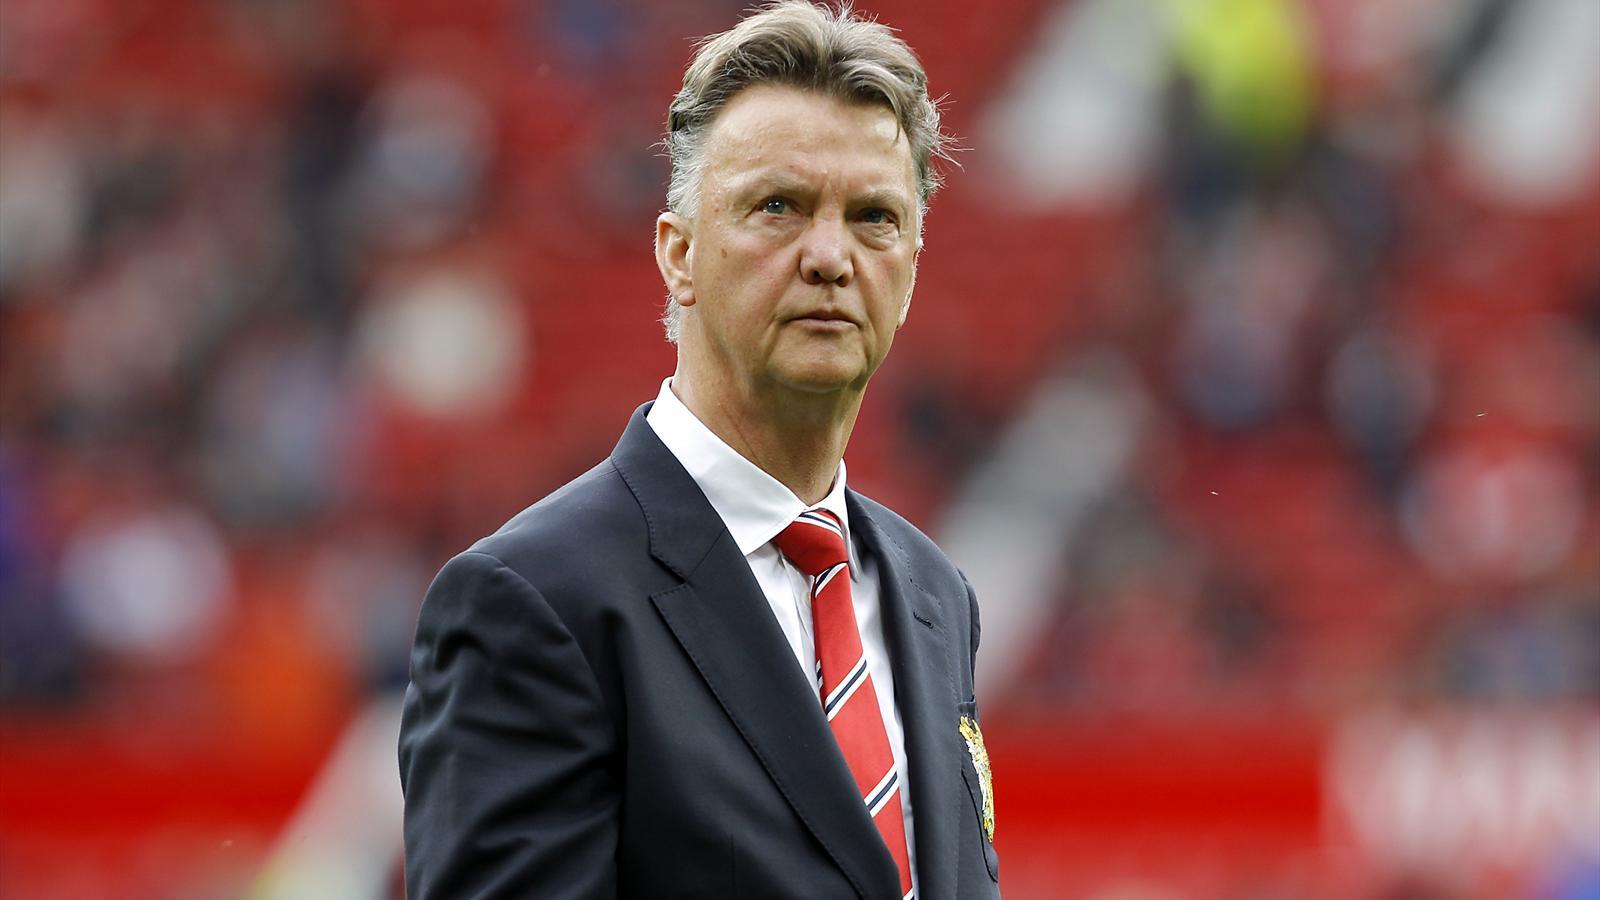 Has Louis Van Gaal Improved Manchester United?